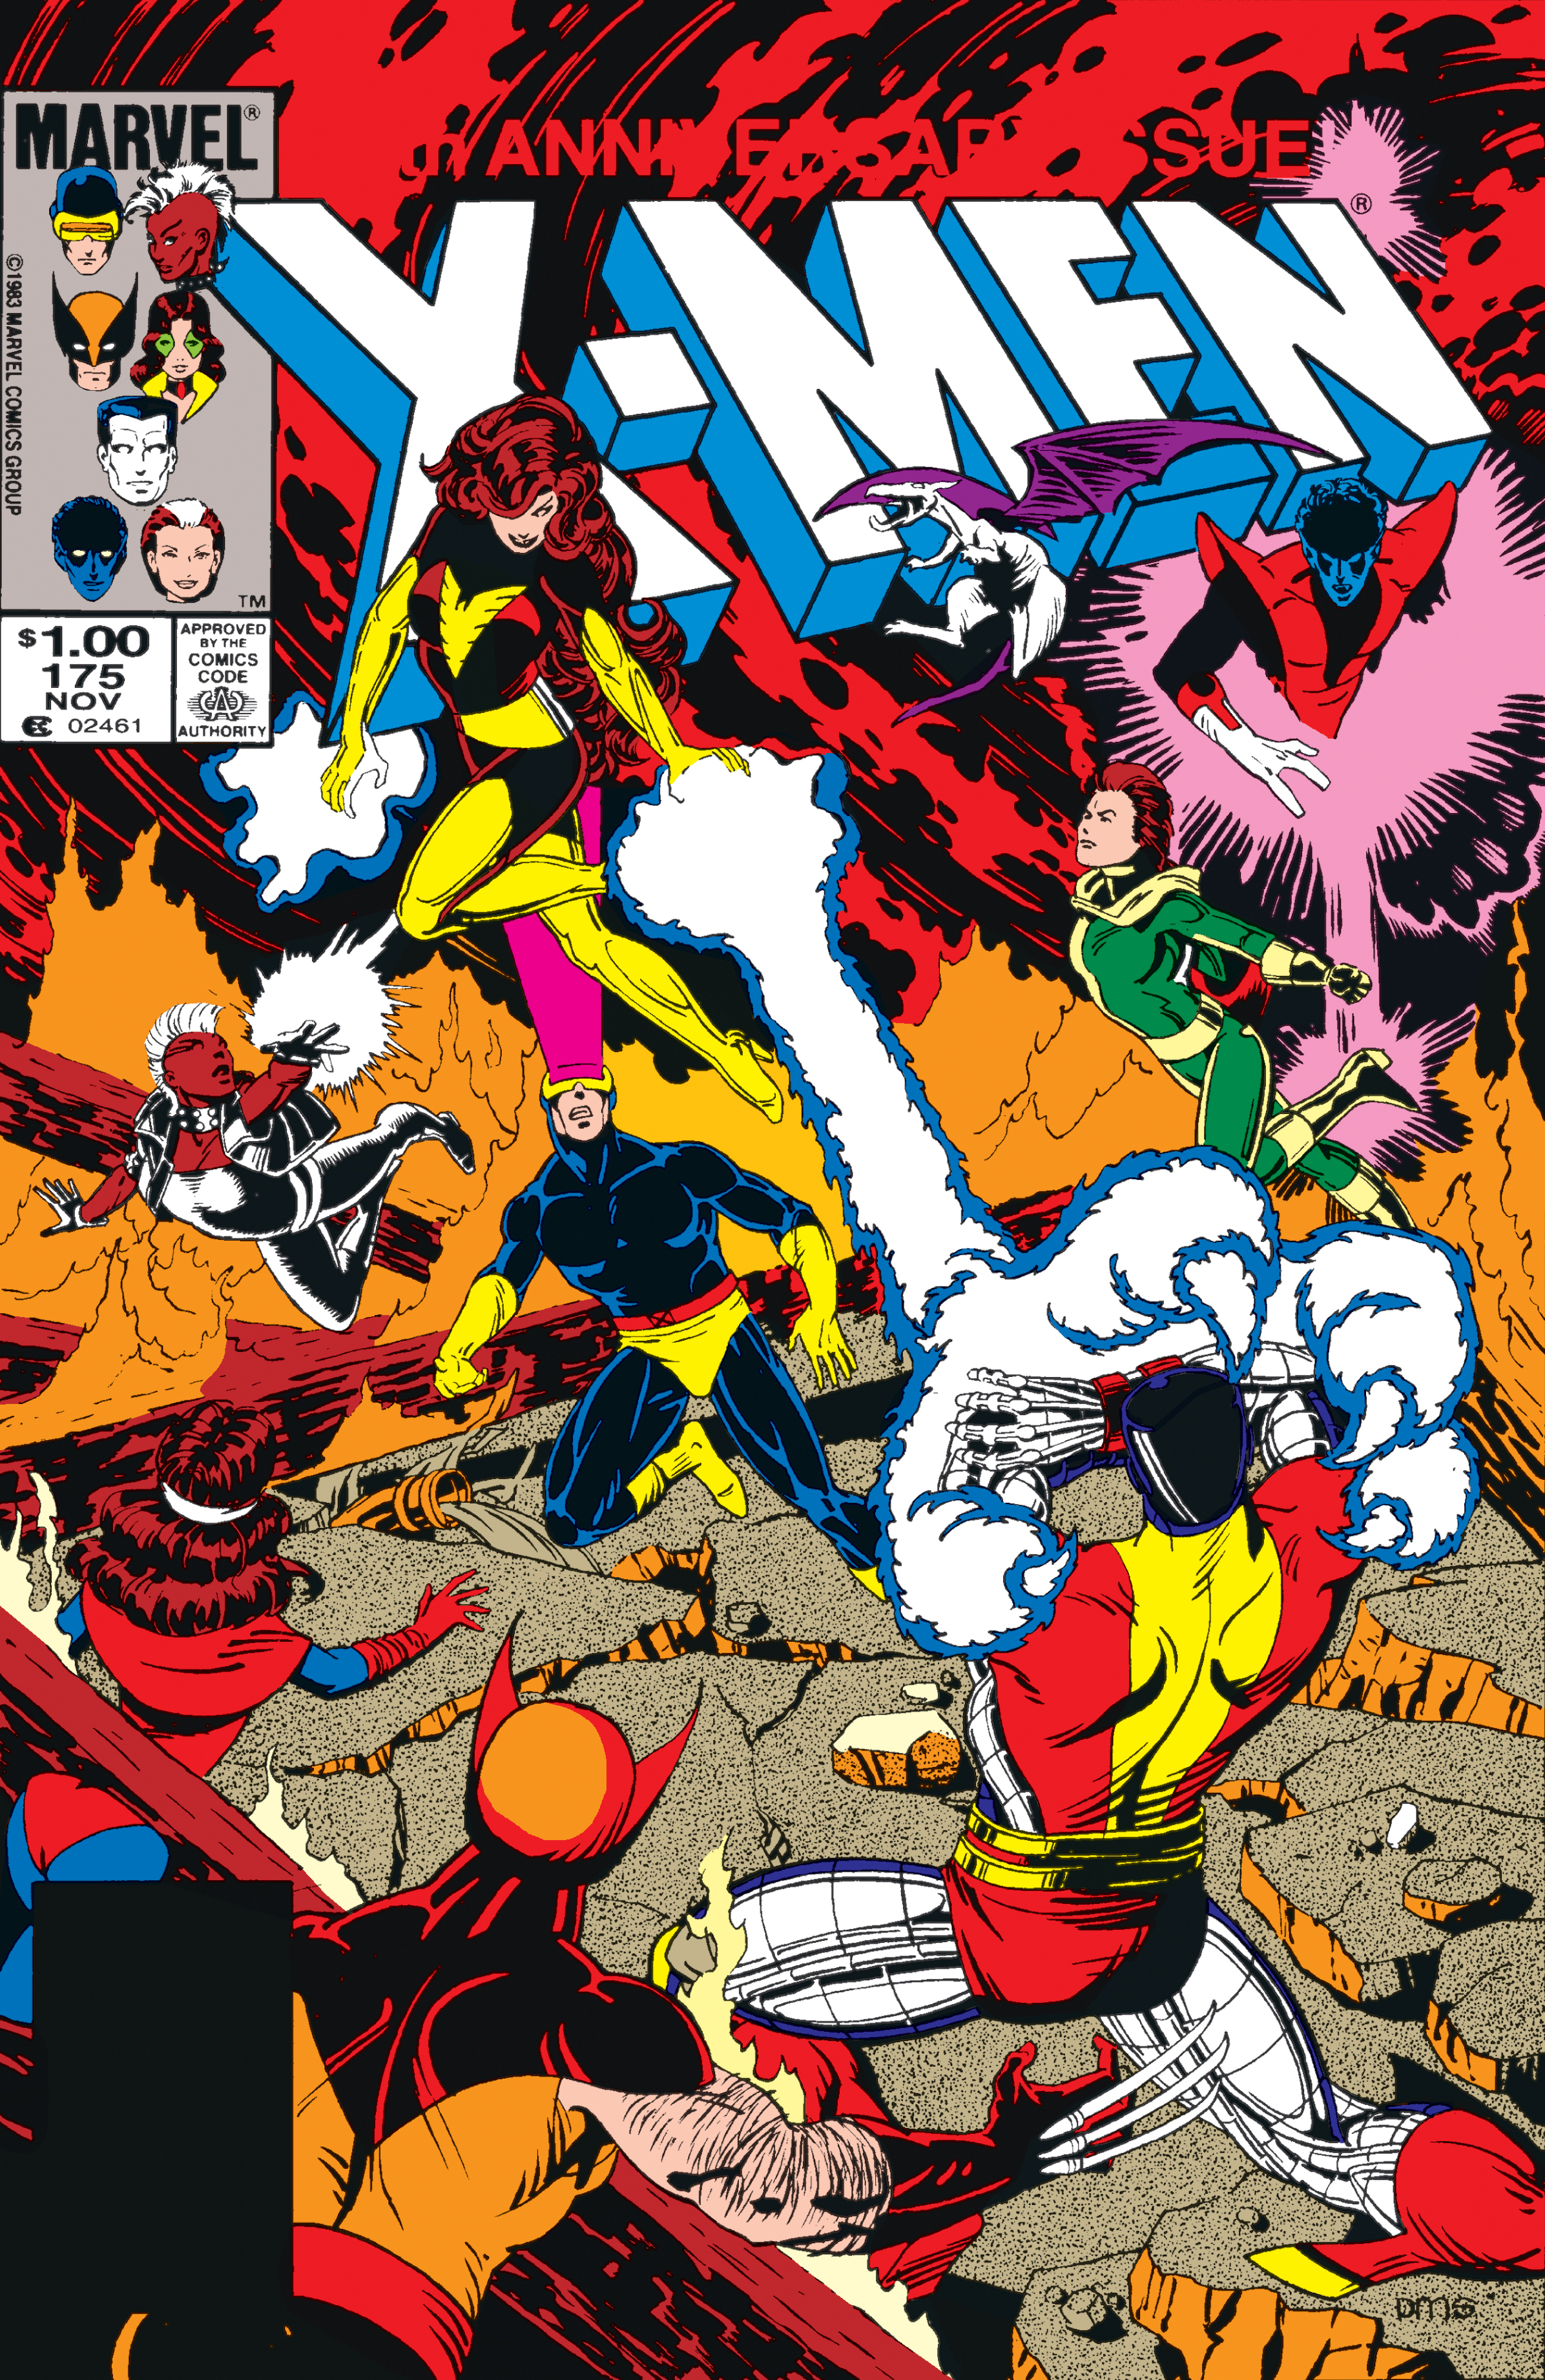 Uncanny X-Men (1963) #175